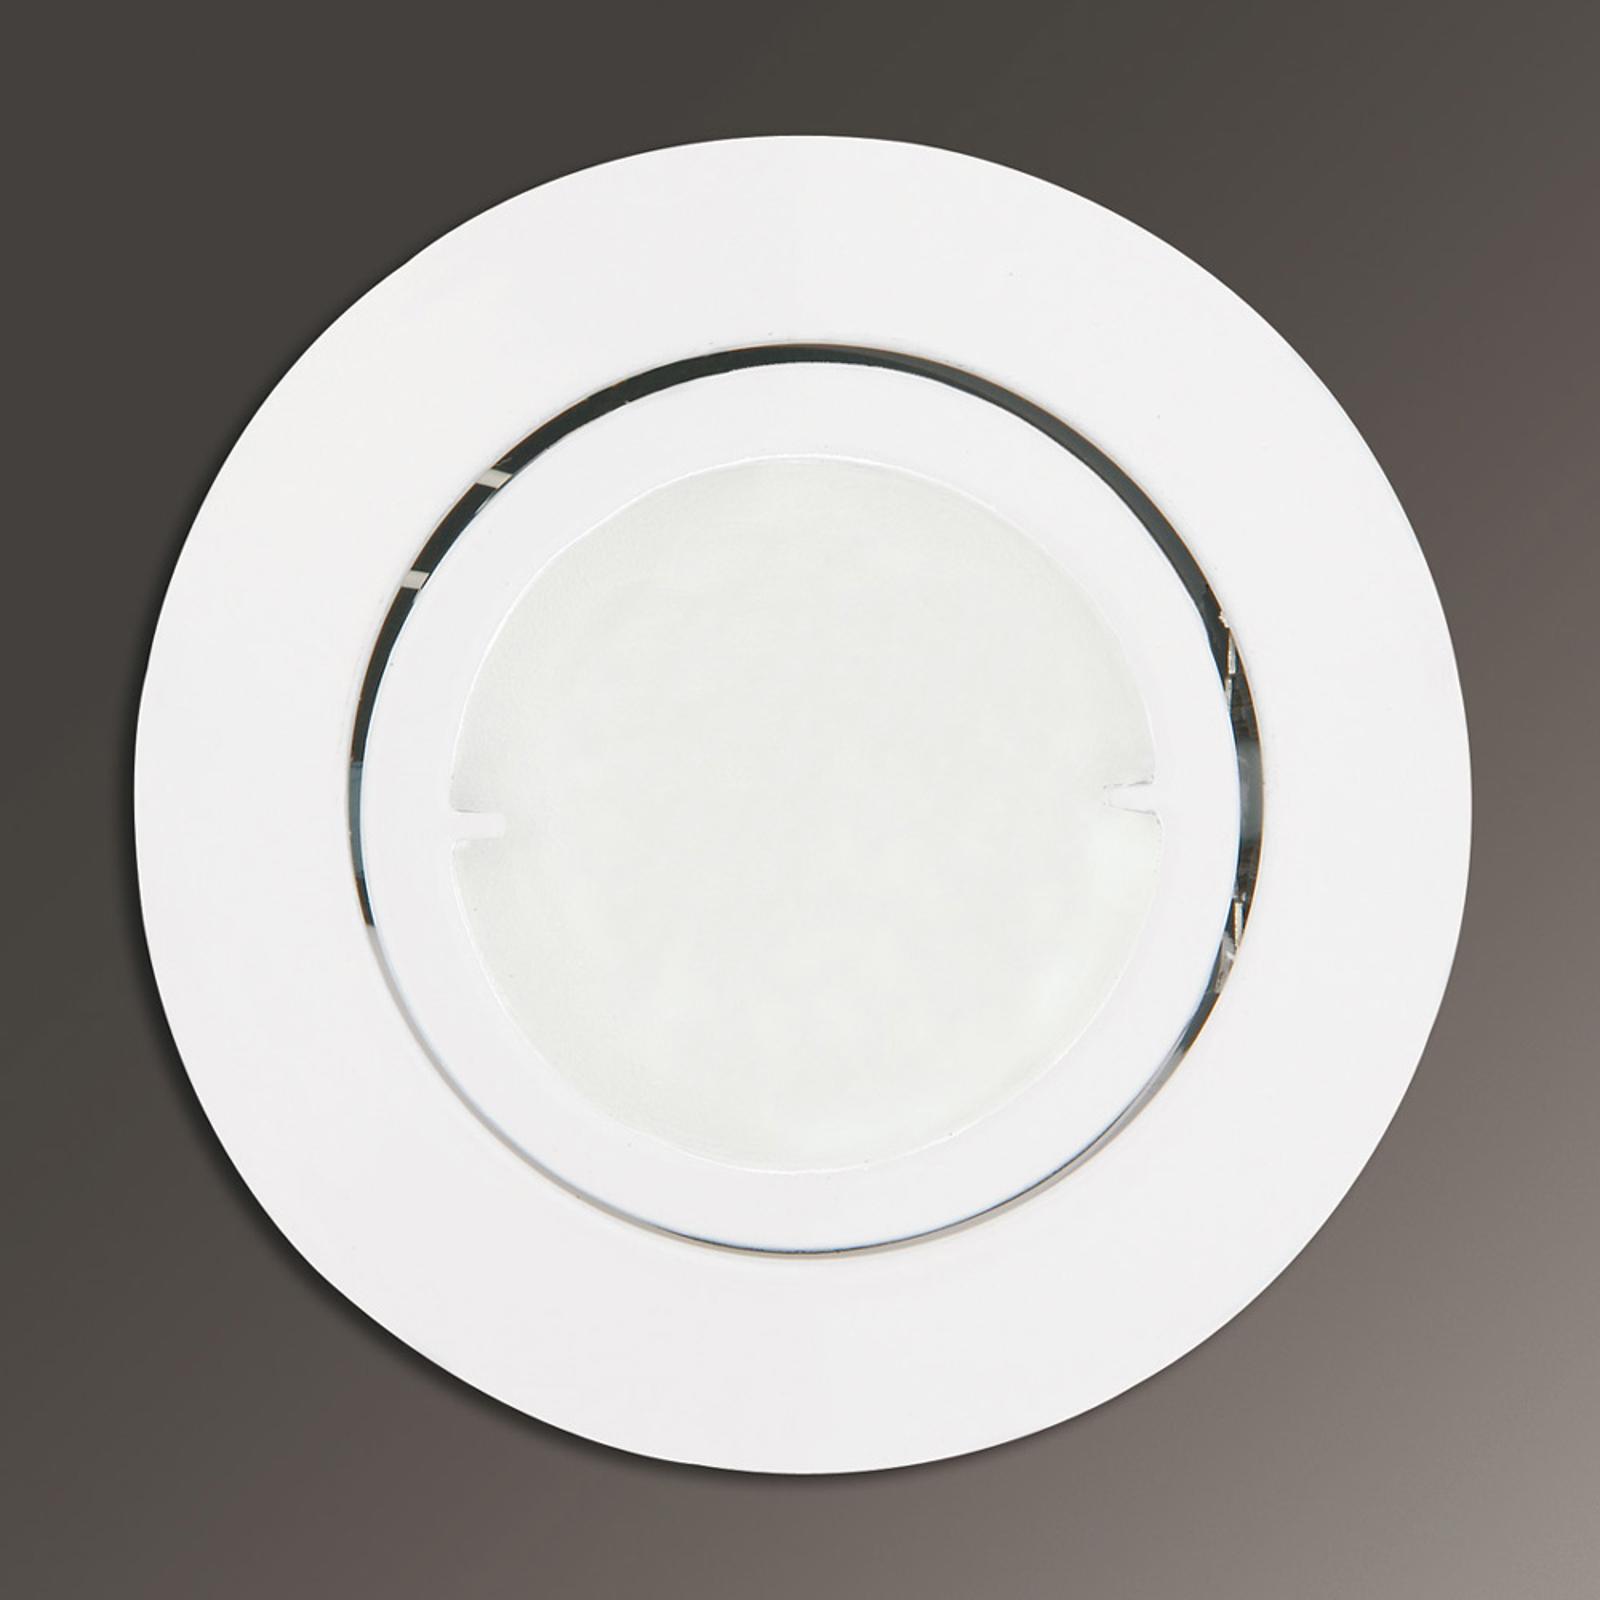 Joanie - lampe encastrable LED en blanc, rond